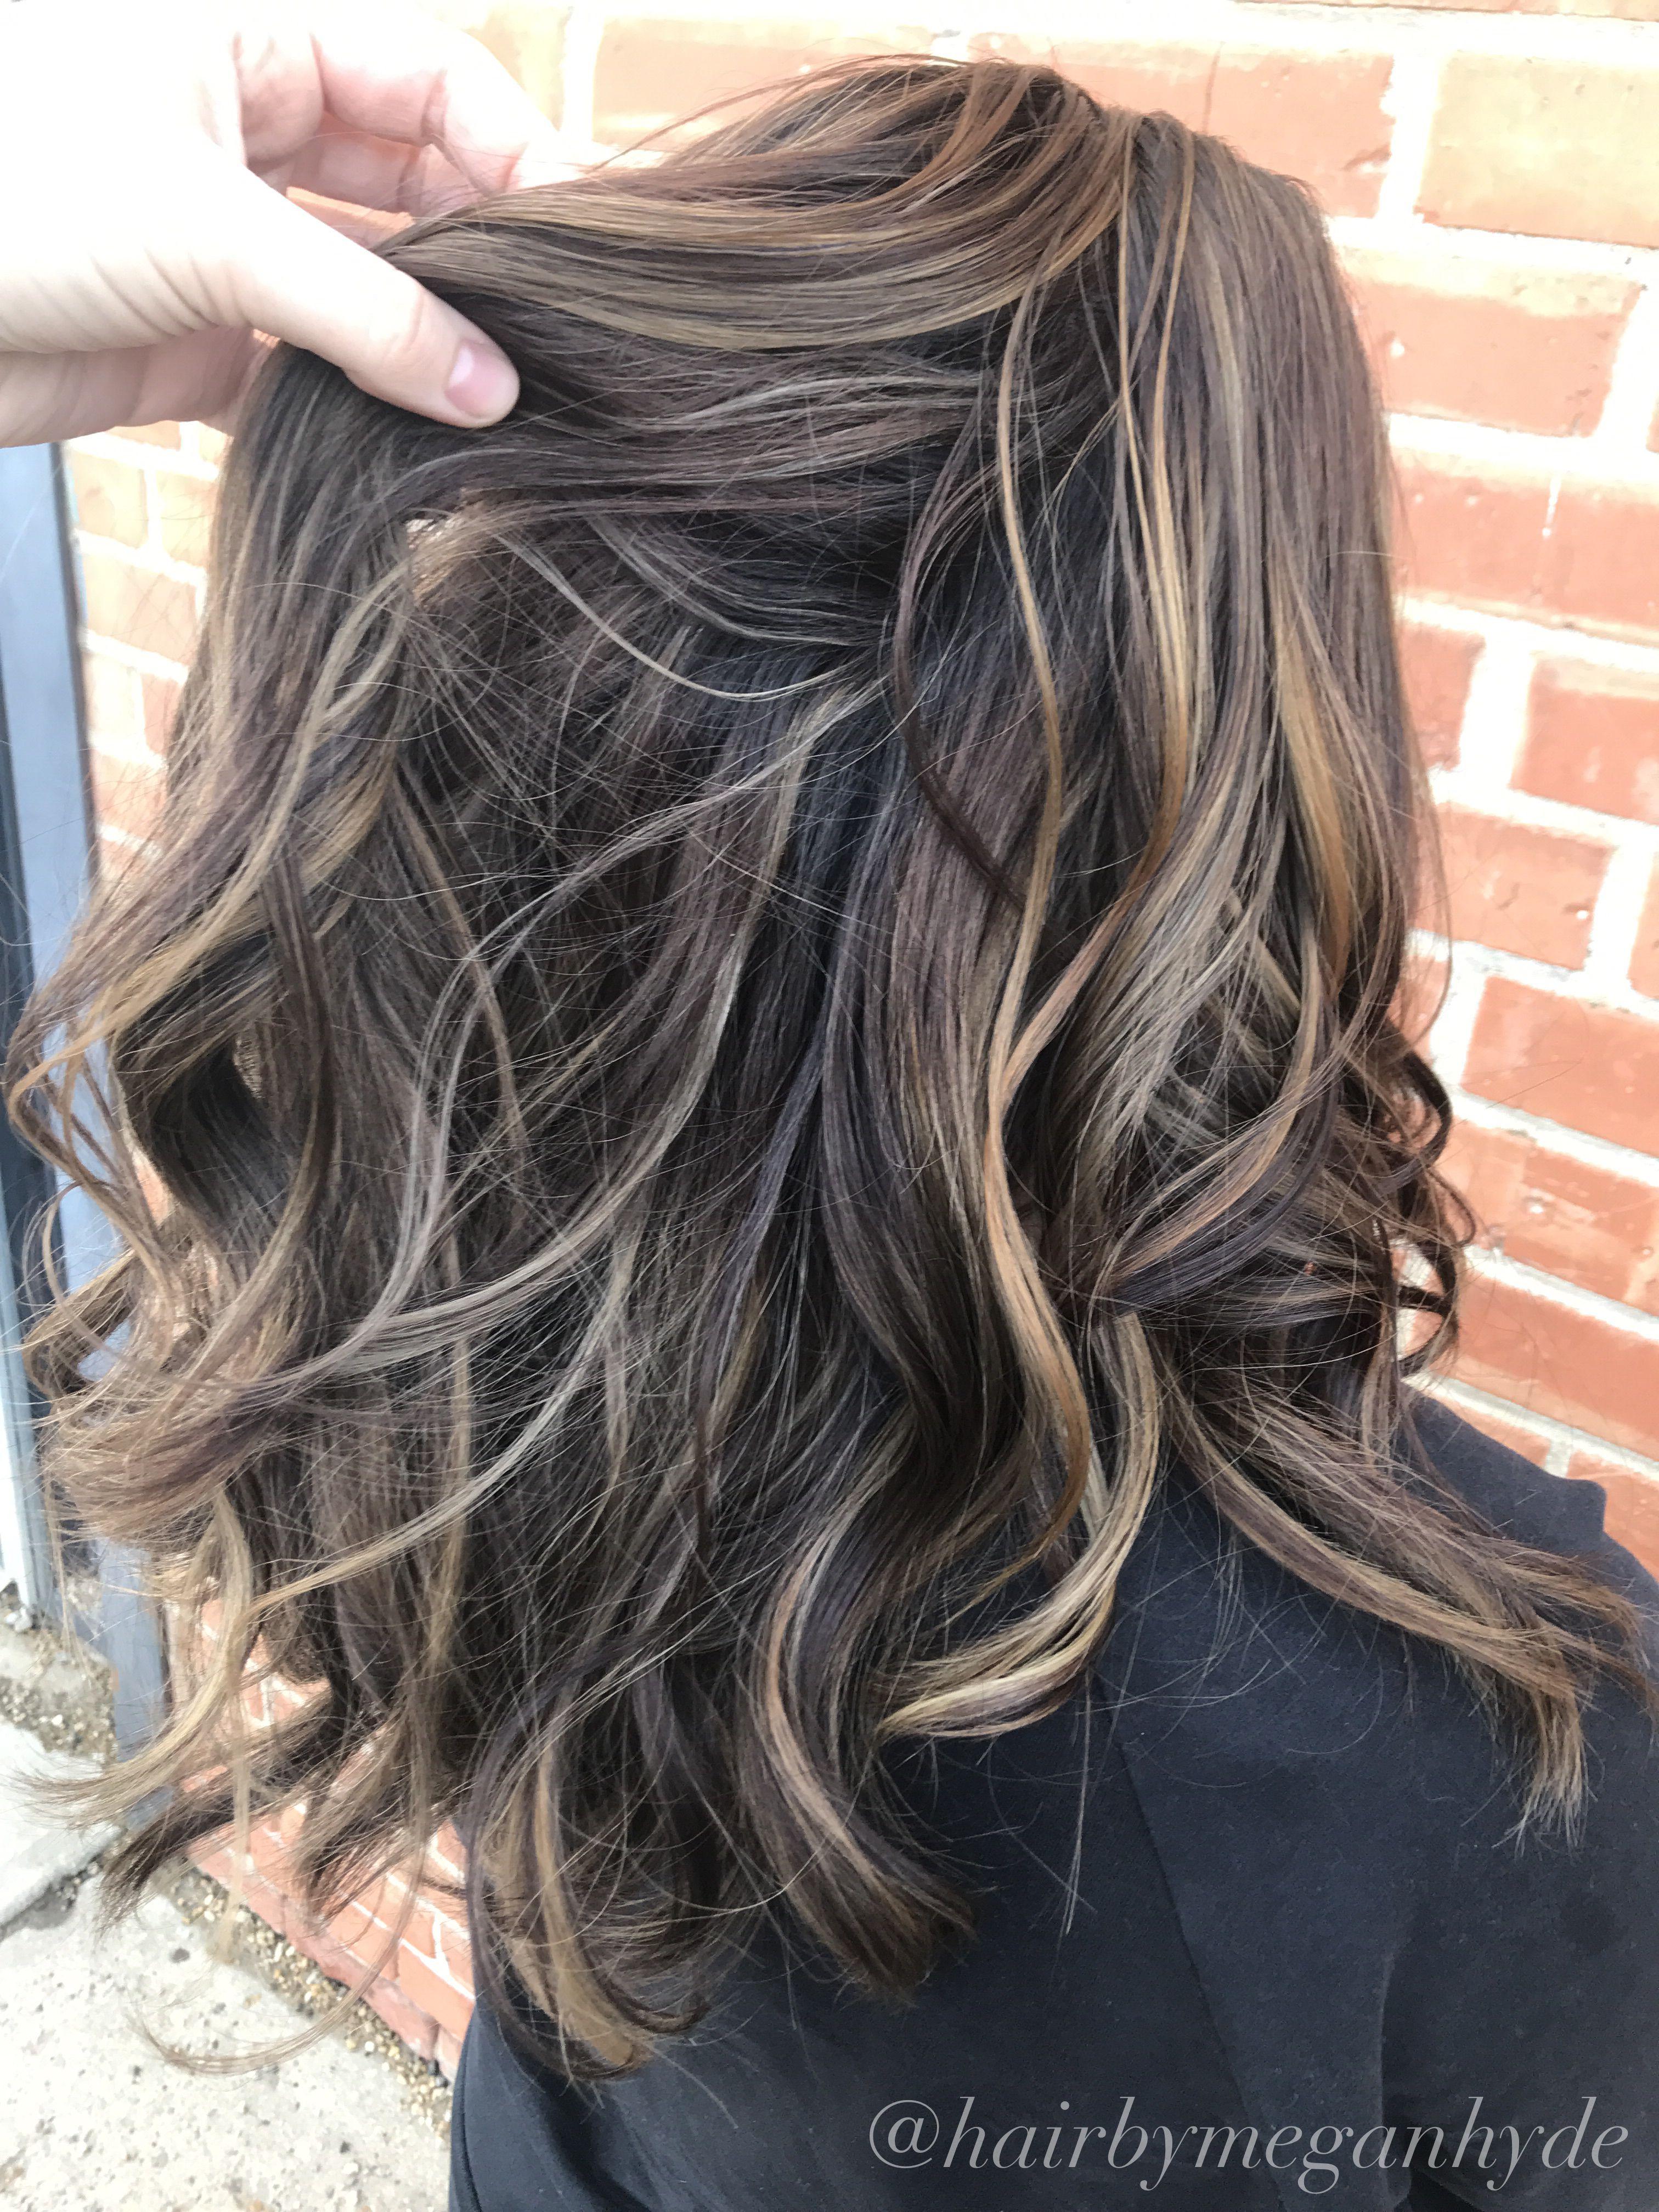 Dimensional Caramel Balayage Balayage Hair Brunette Darkhair Dimension Hair Color For Morena Skin Hair Color For Morena Balayage Hair